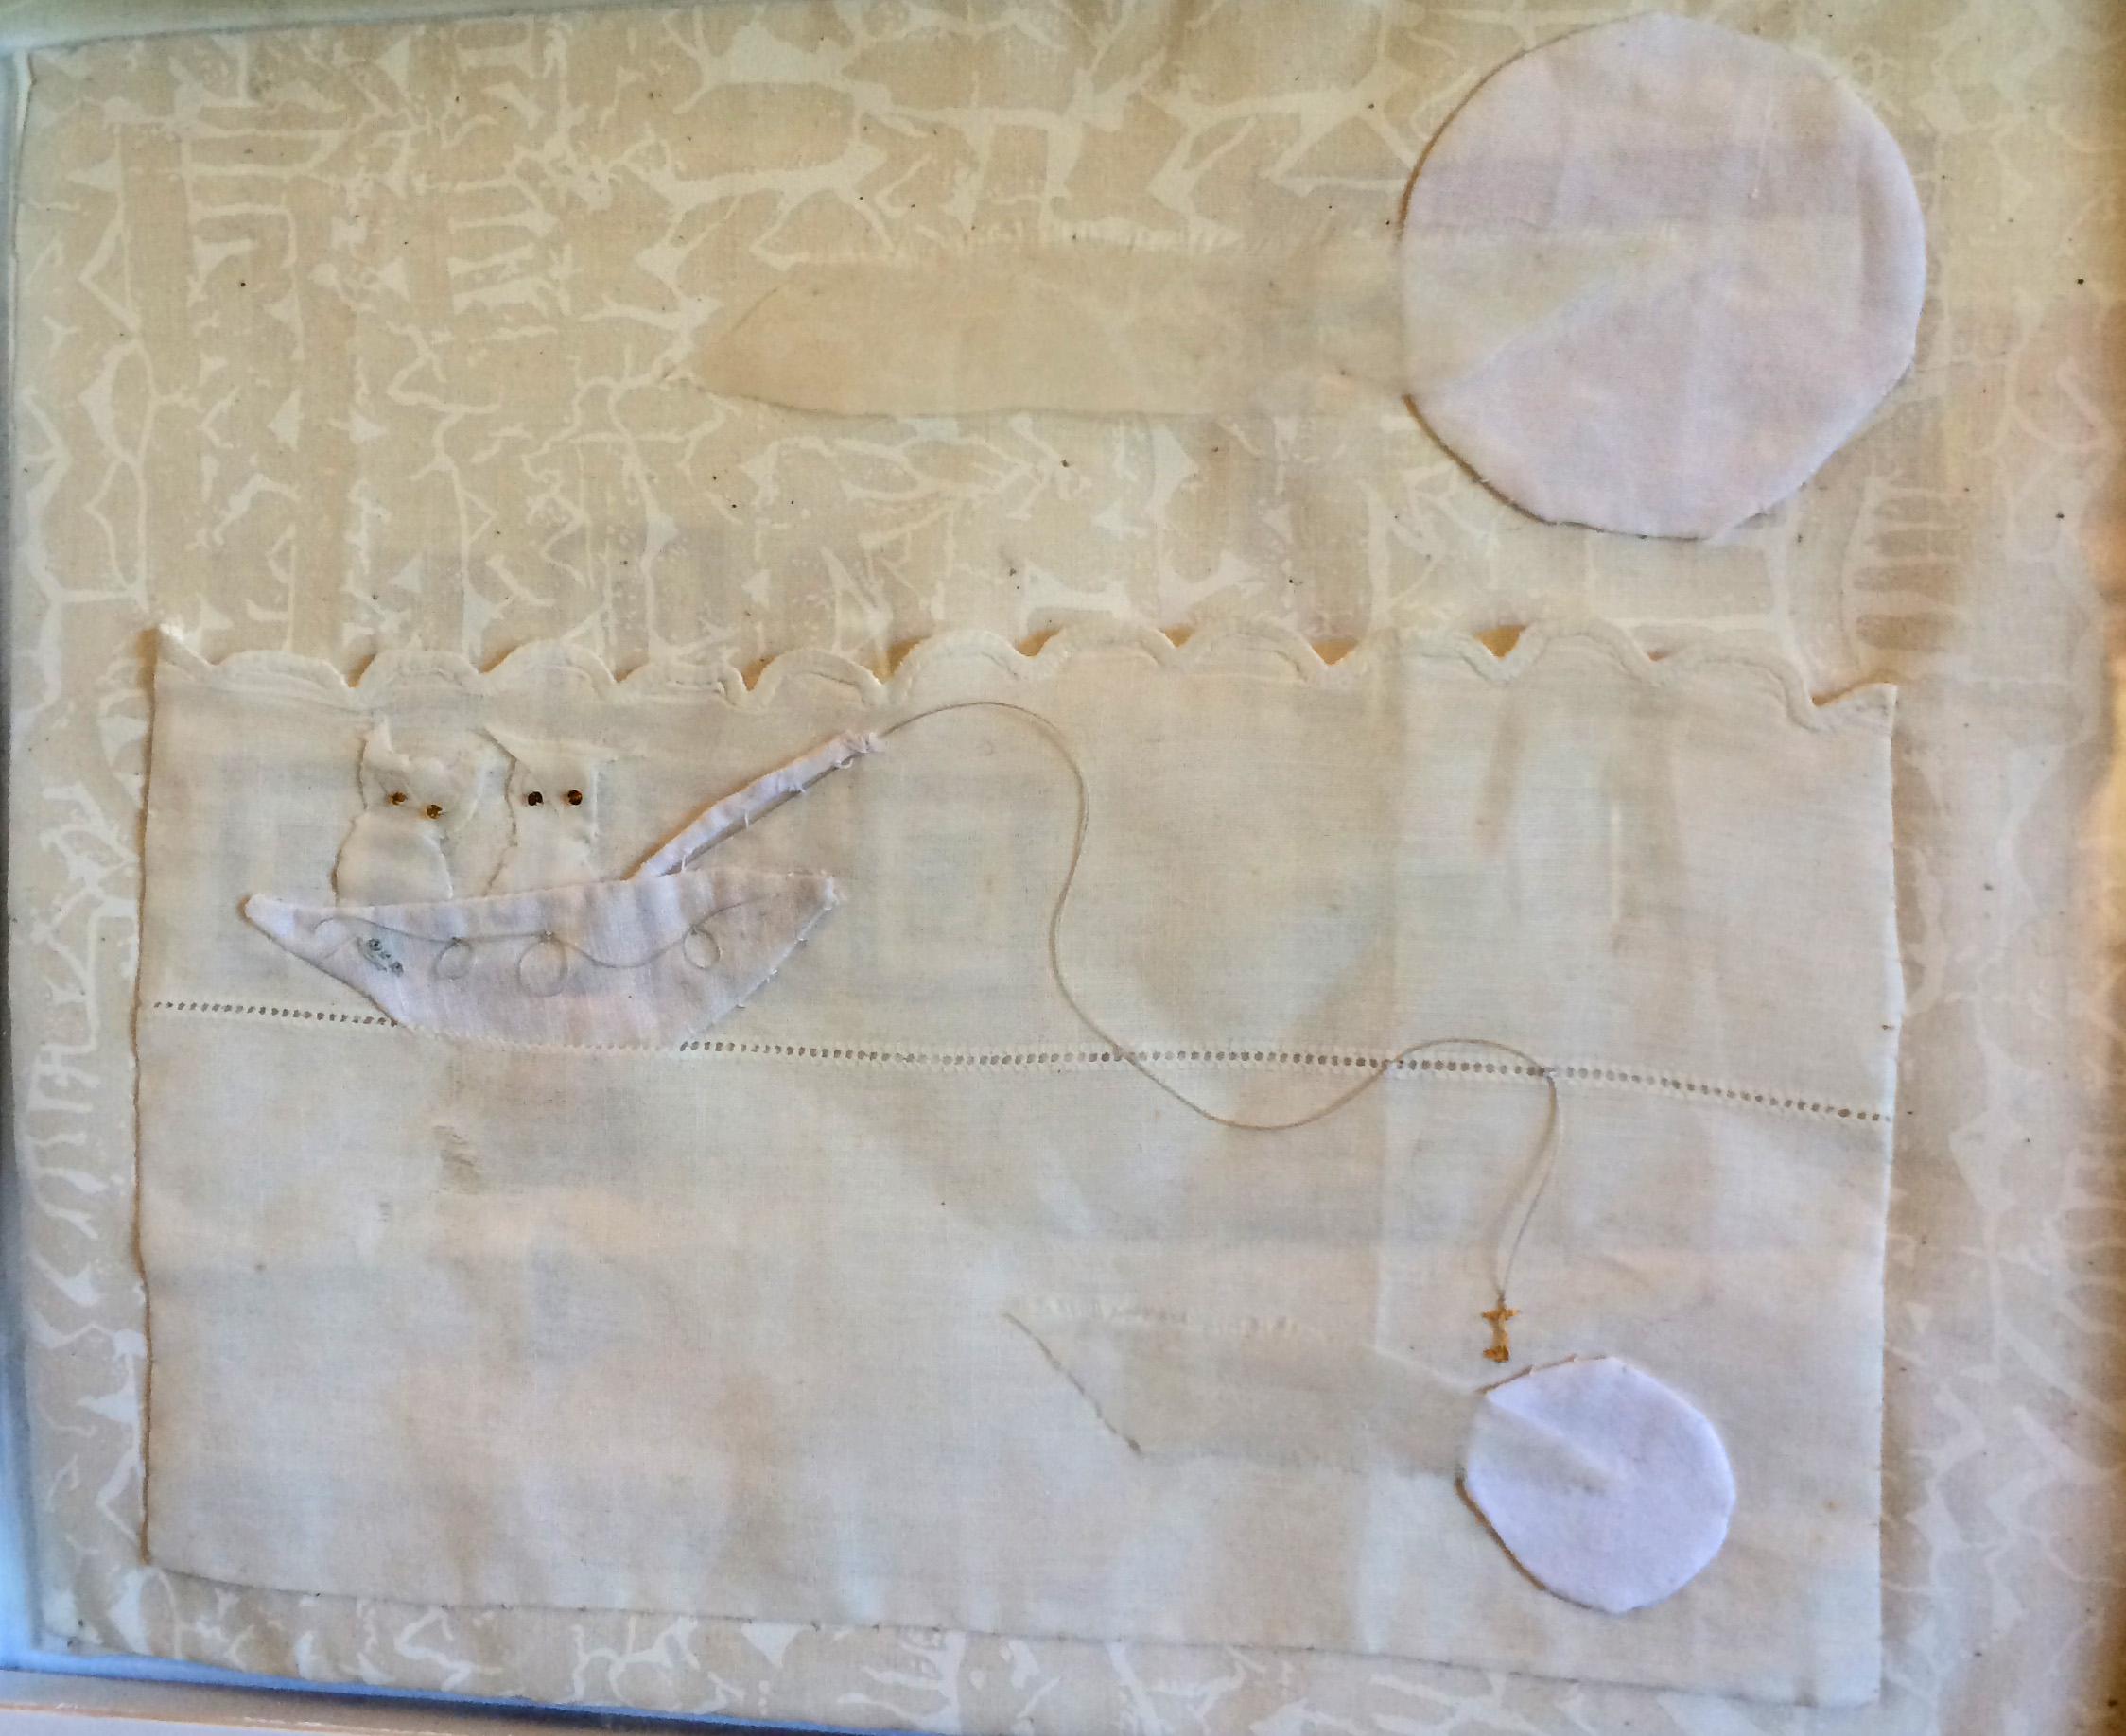 Kit Stafford's white on white work (1)